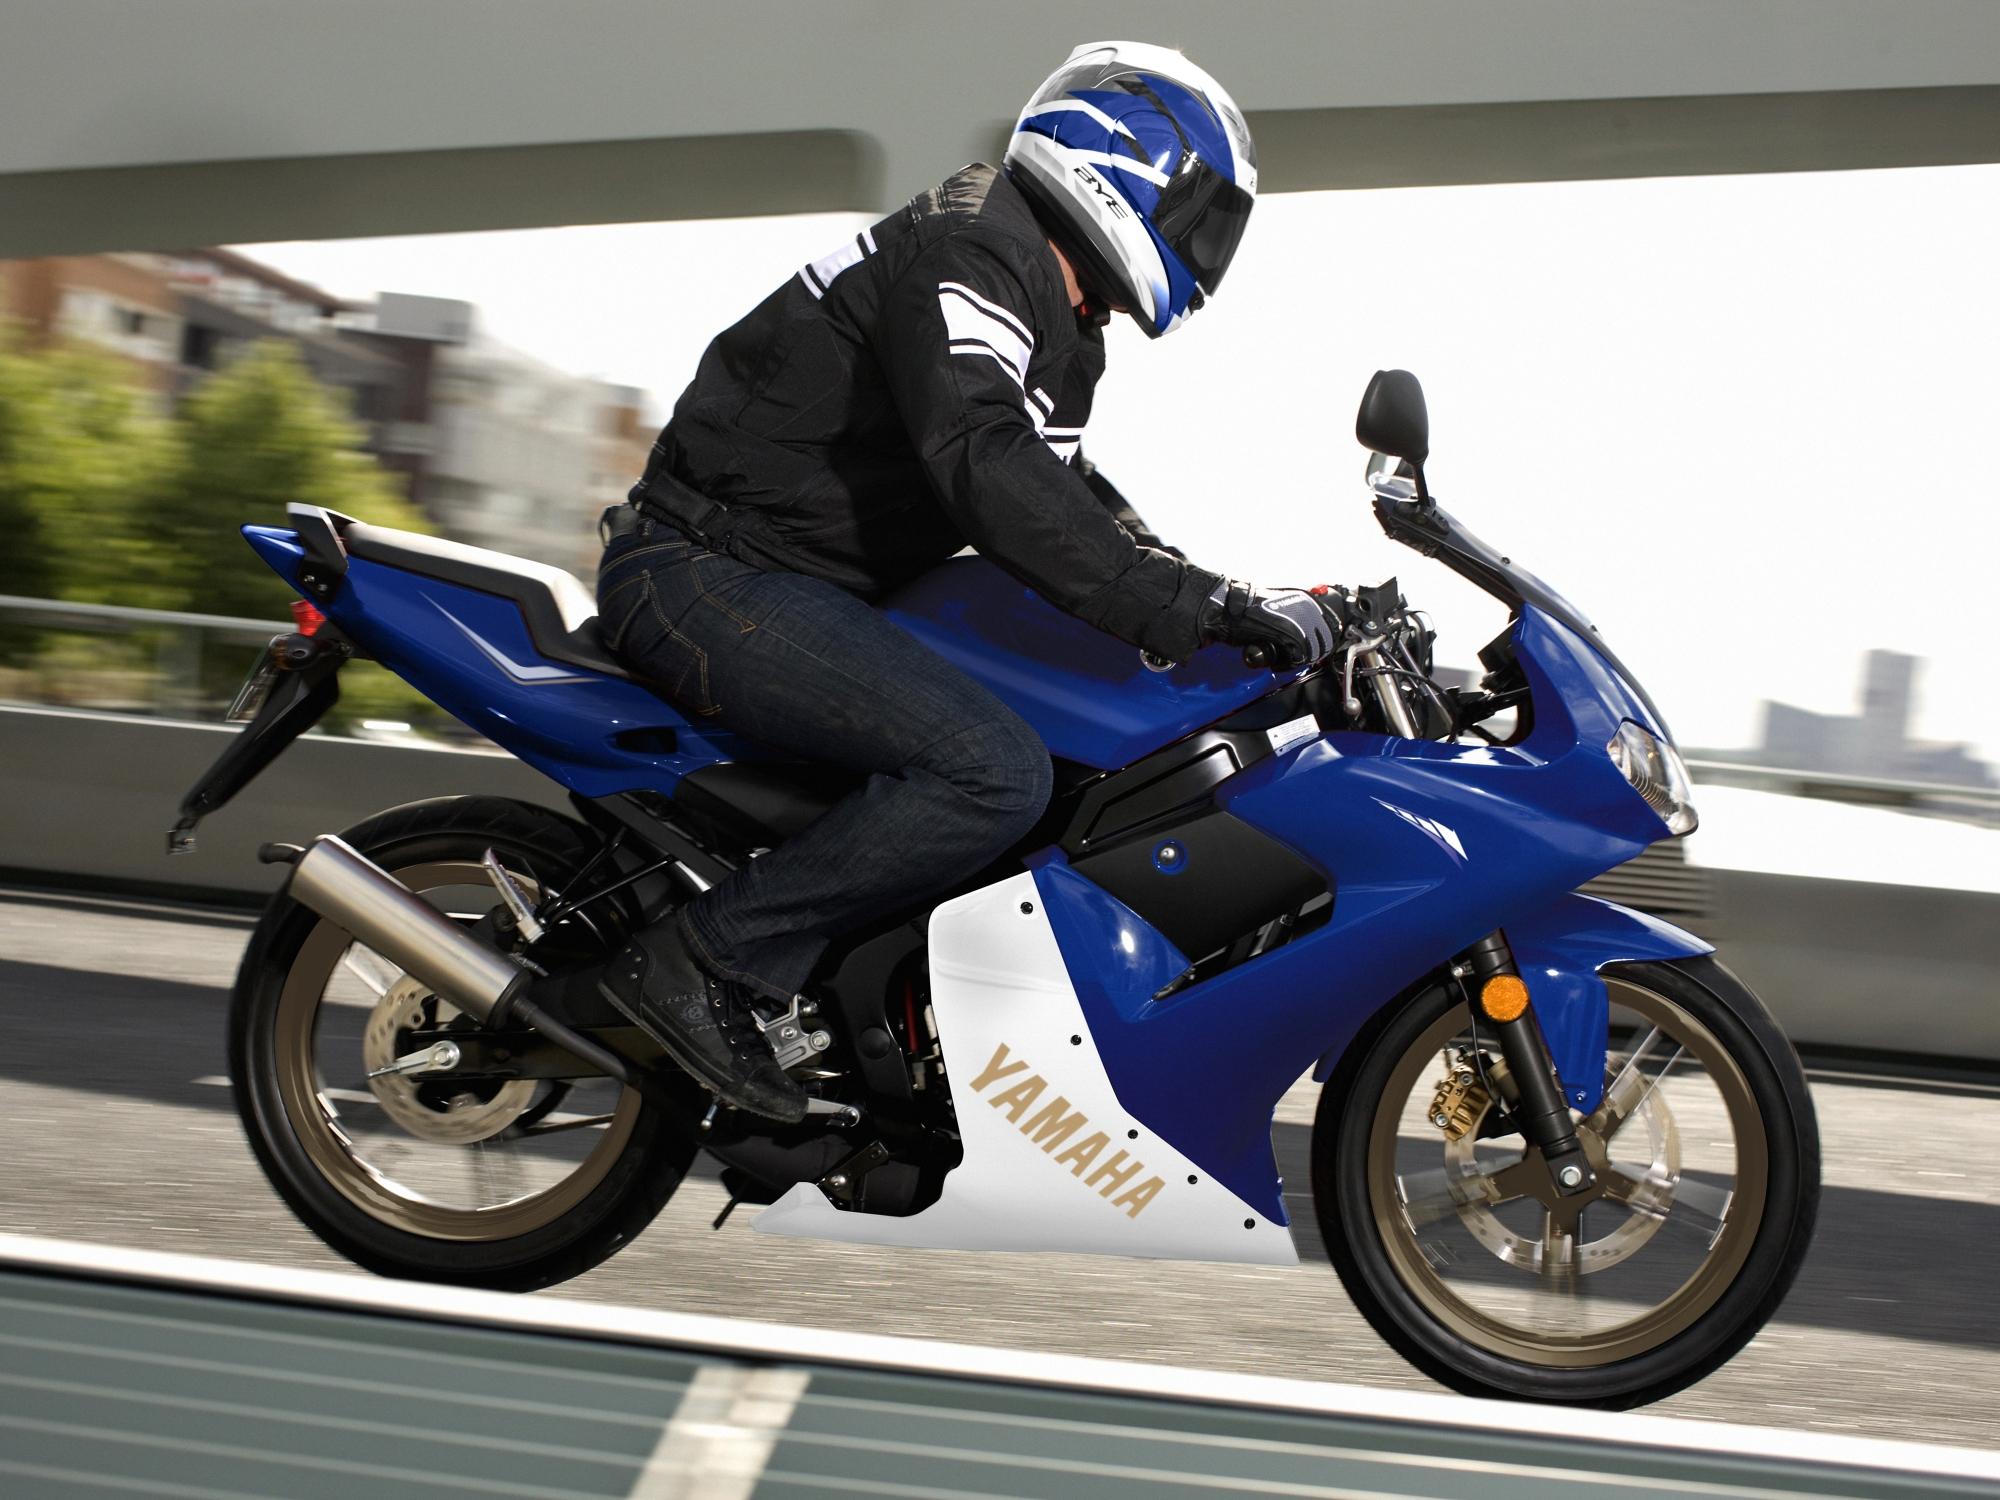 Yamaha Tzr 50ccm Yamaha Tzr 50 2013 Foto 8